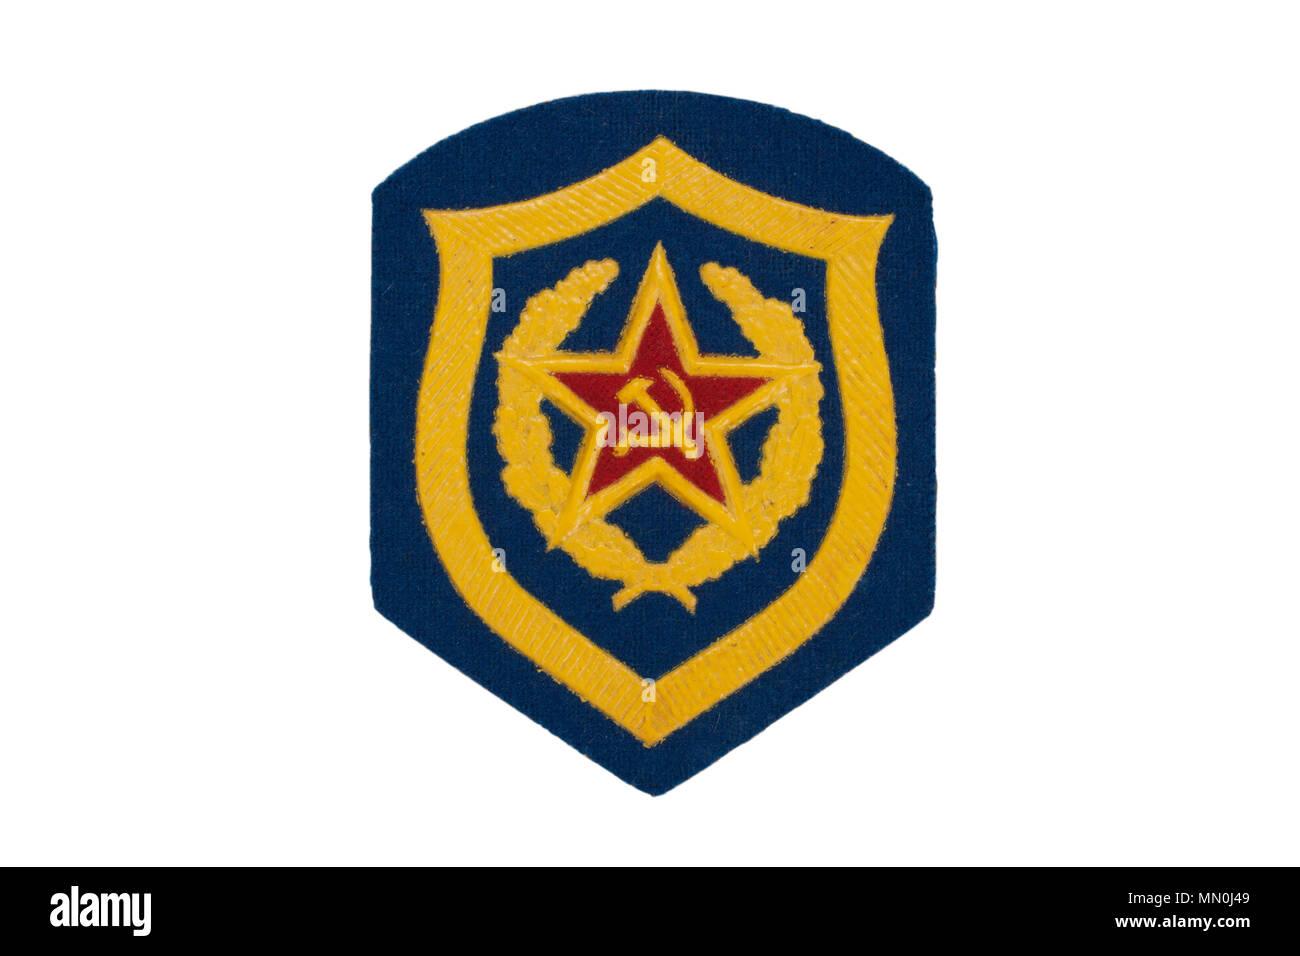 soviet army mechanized infantry badge isolated - Stock Image